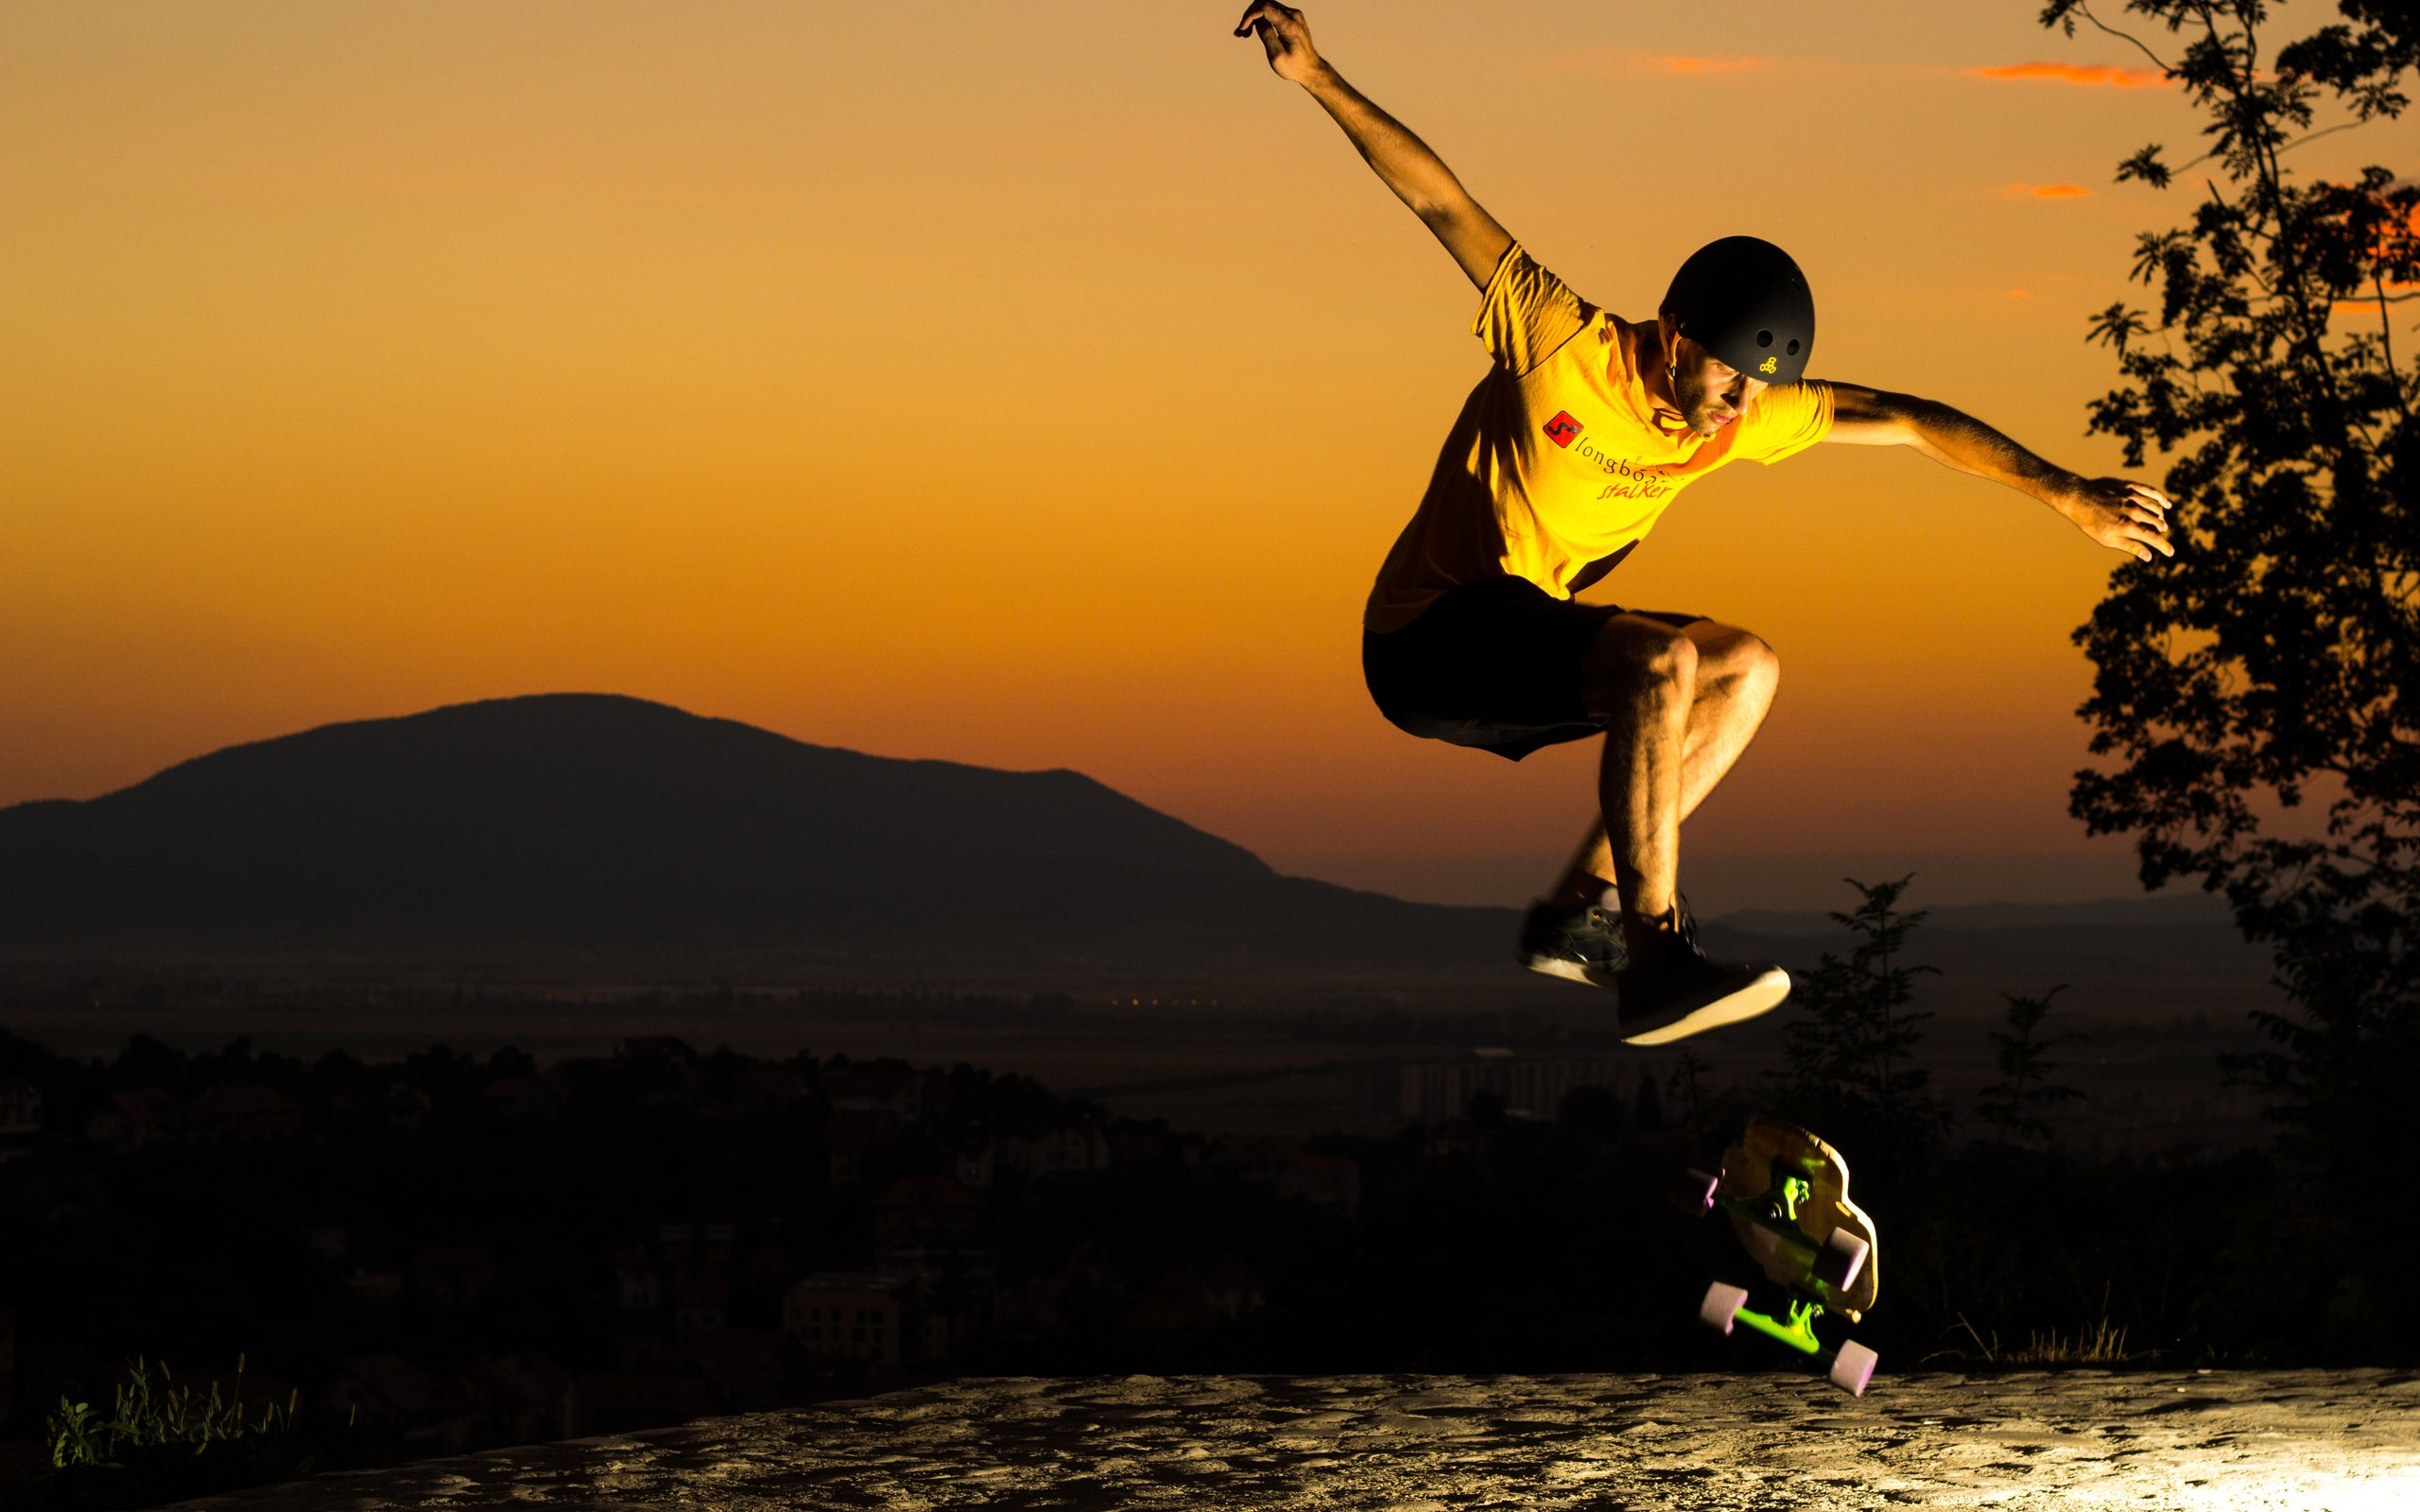 File Name Cool Skateboarding Wallpaper 2560x1600